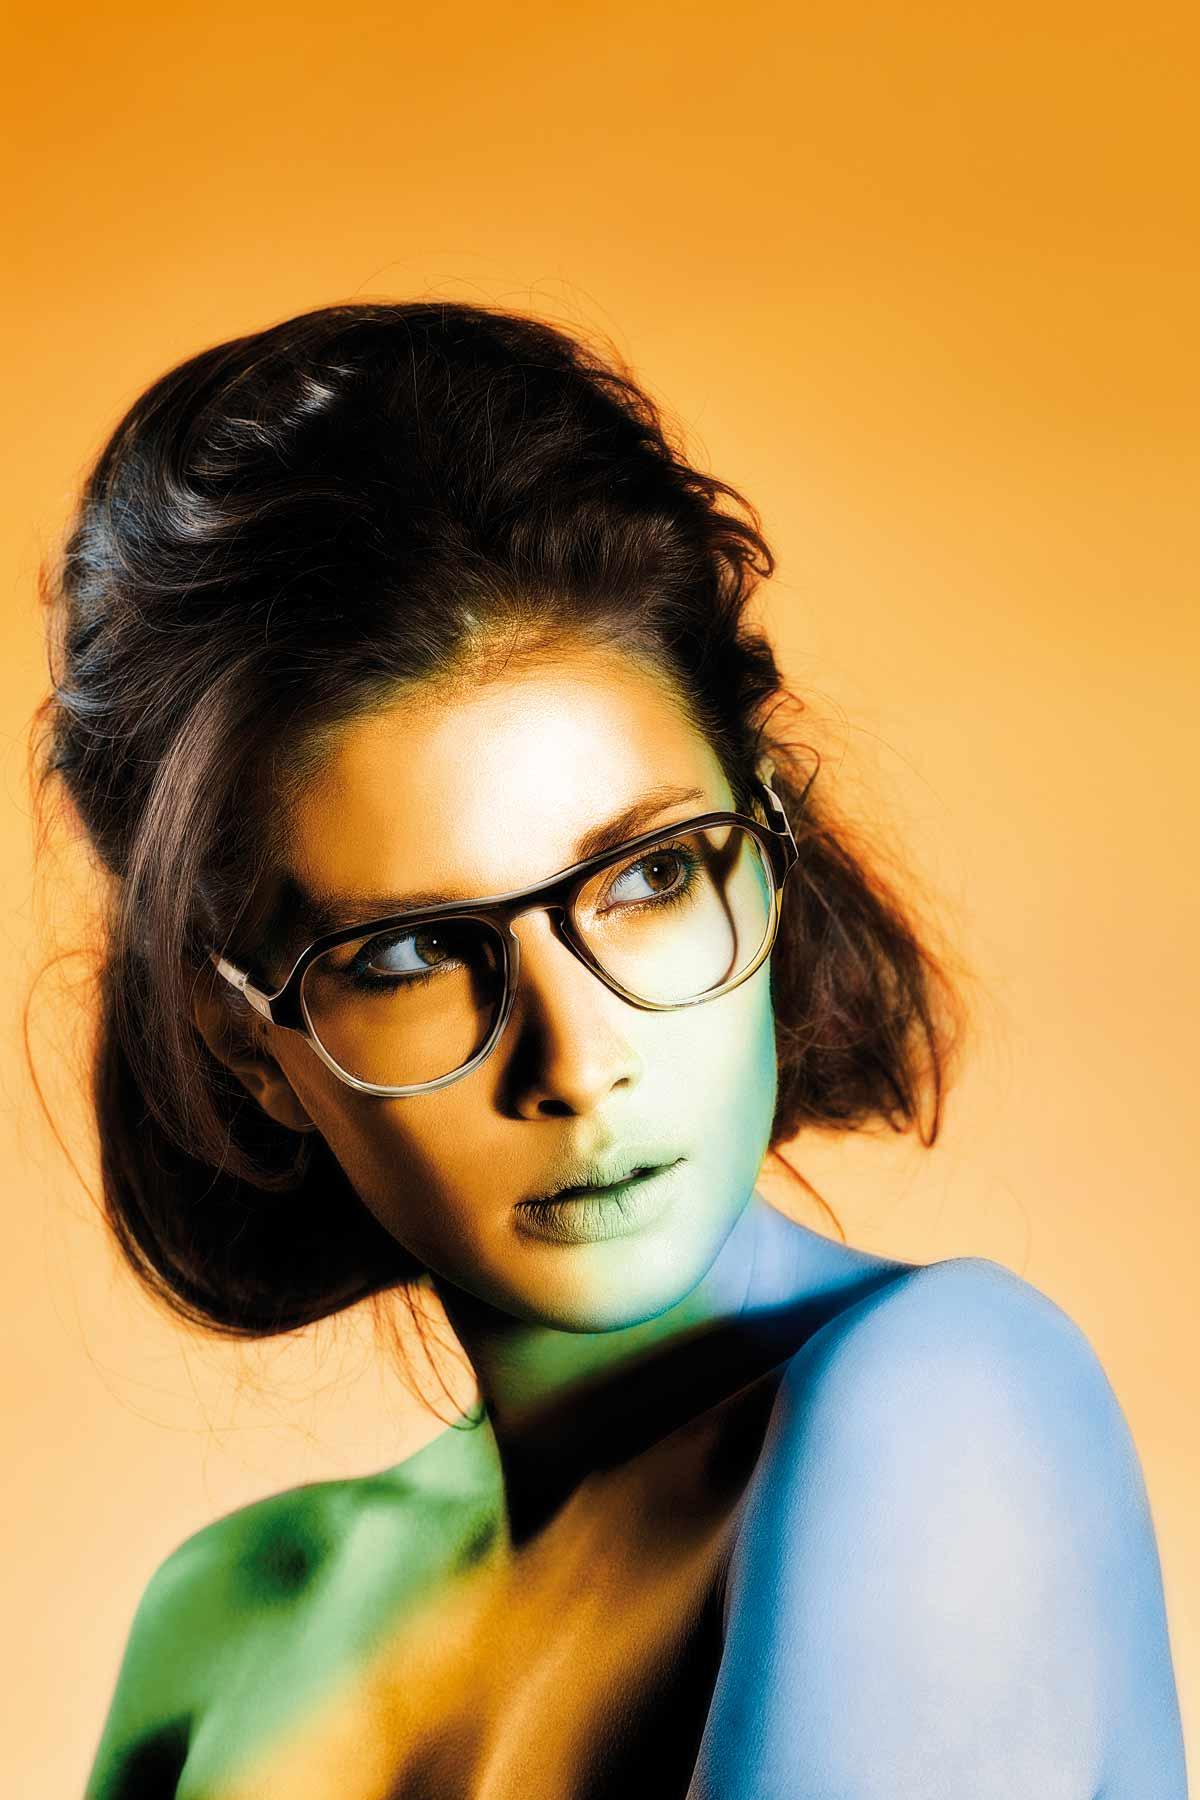 Eyewear Magazine 2_2011.03.13-people-eyewear-23556